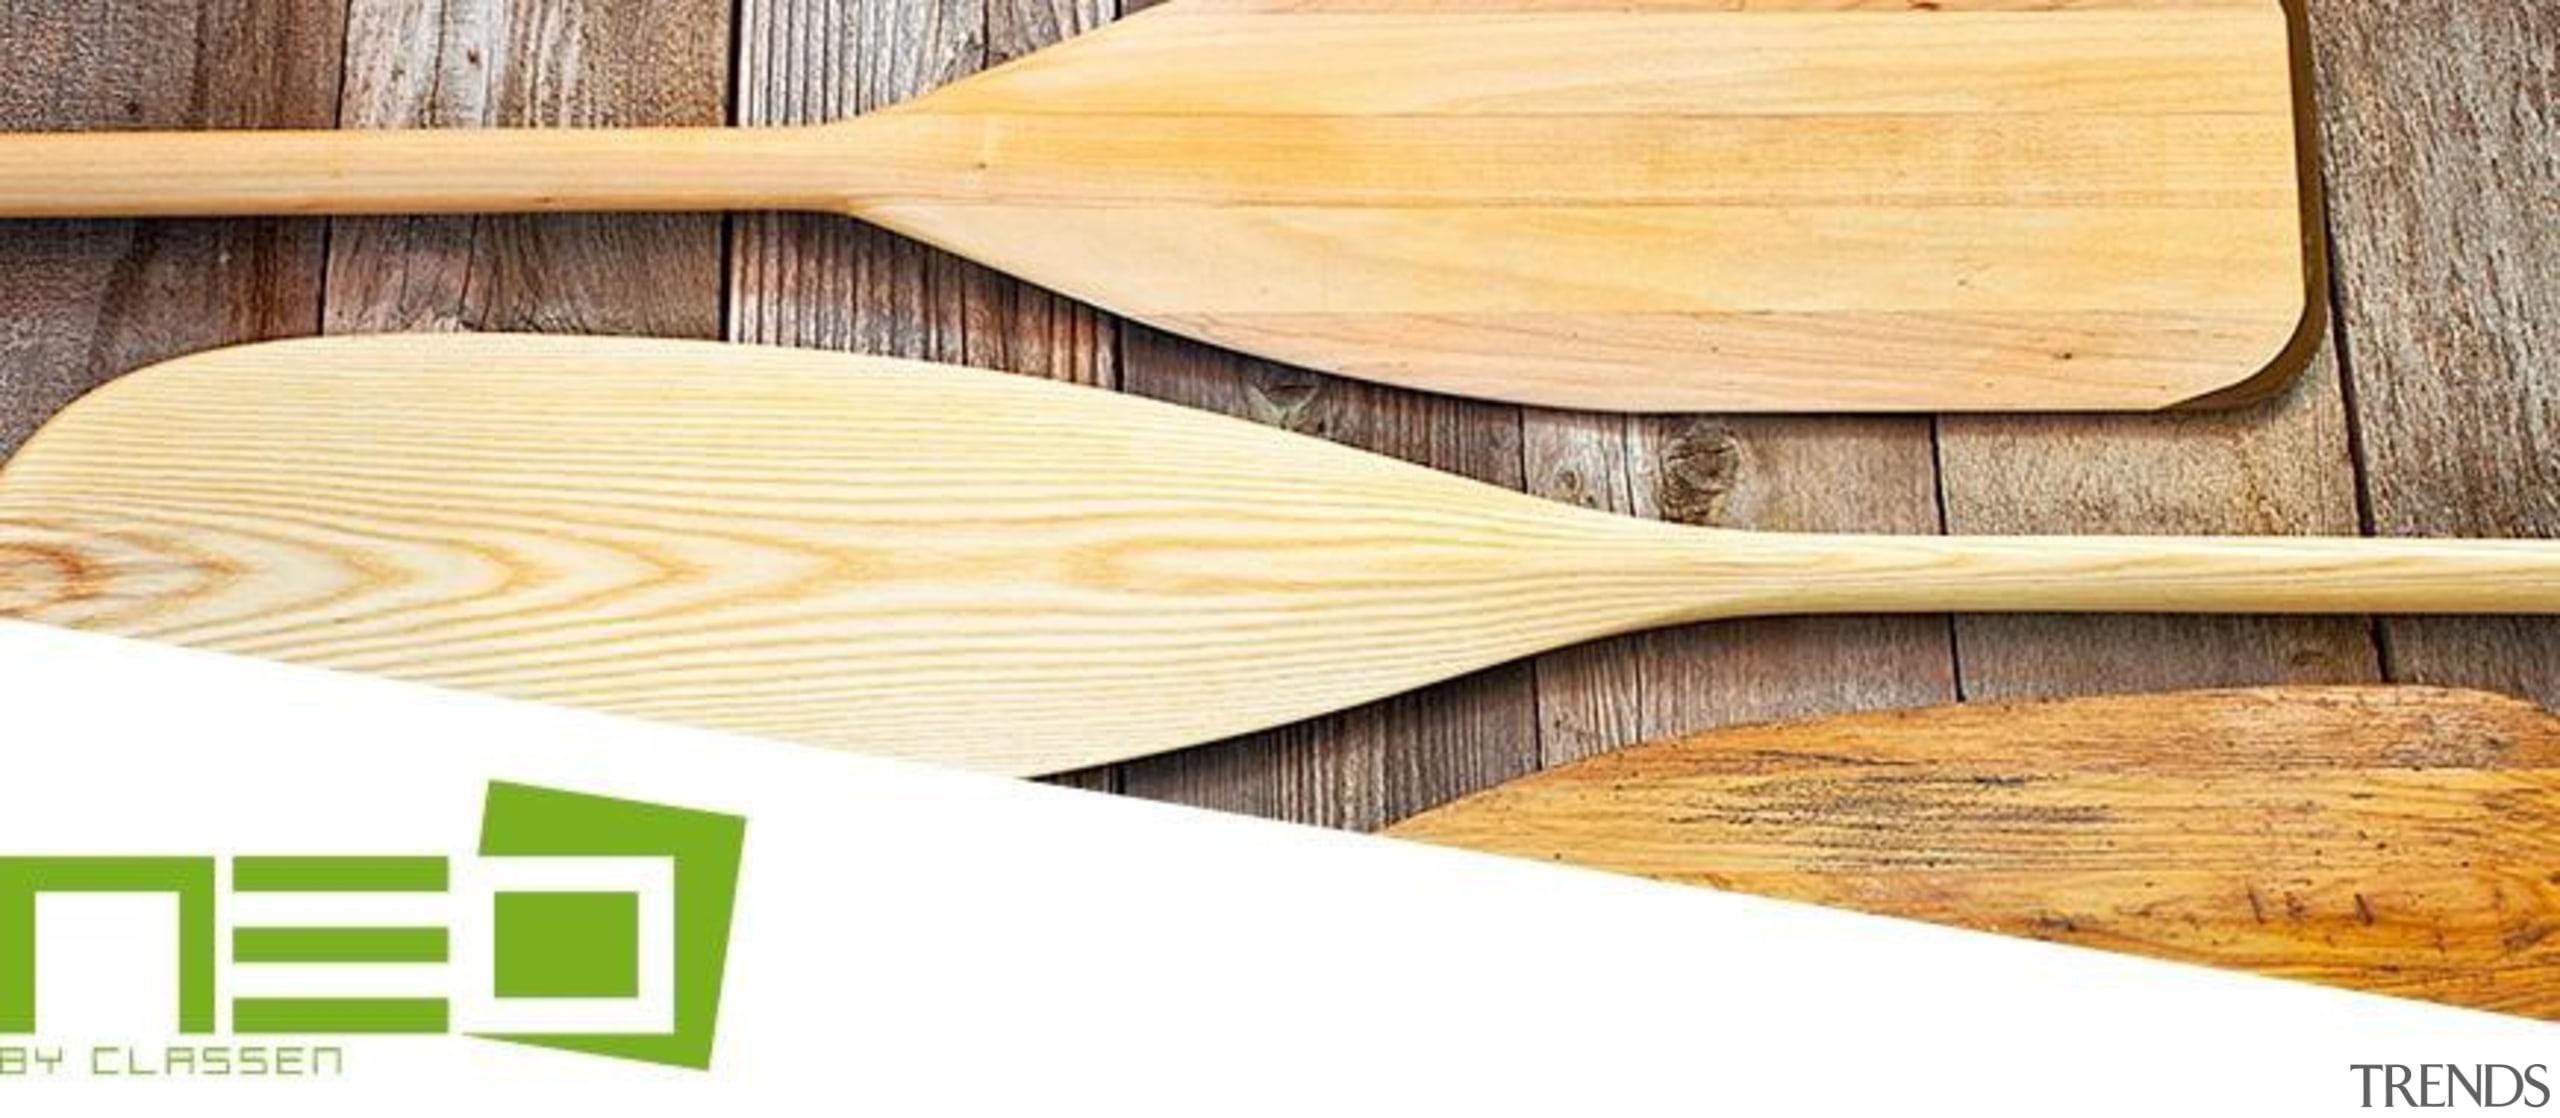 Water Resistant flooringFor more information, please visit